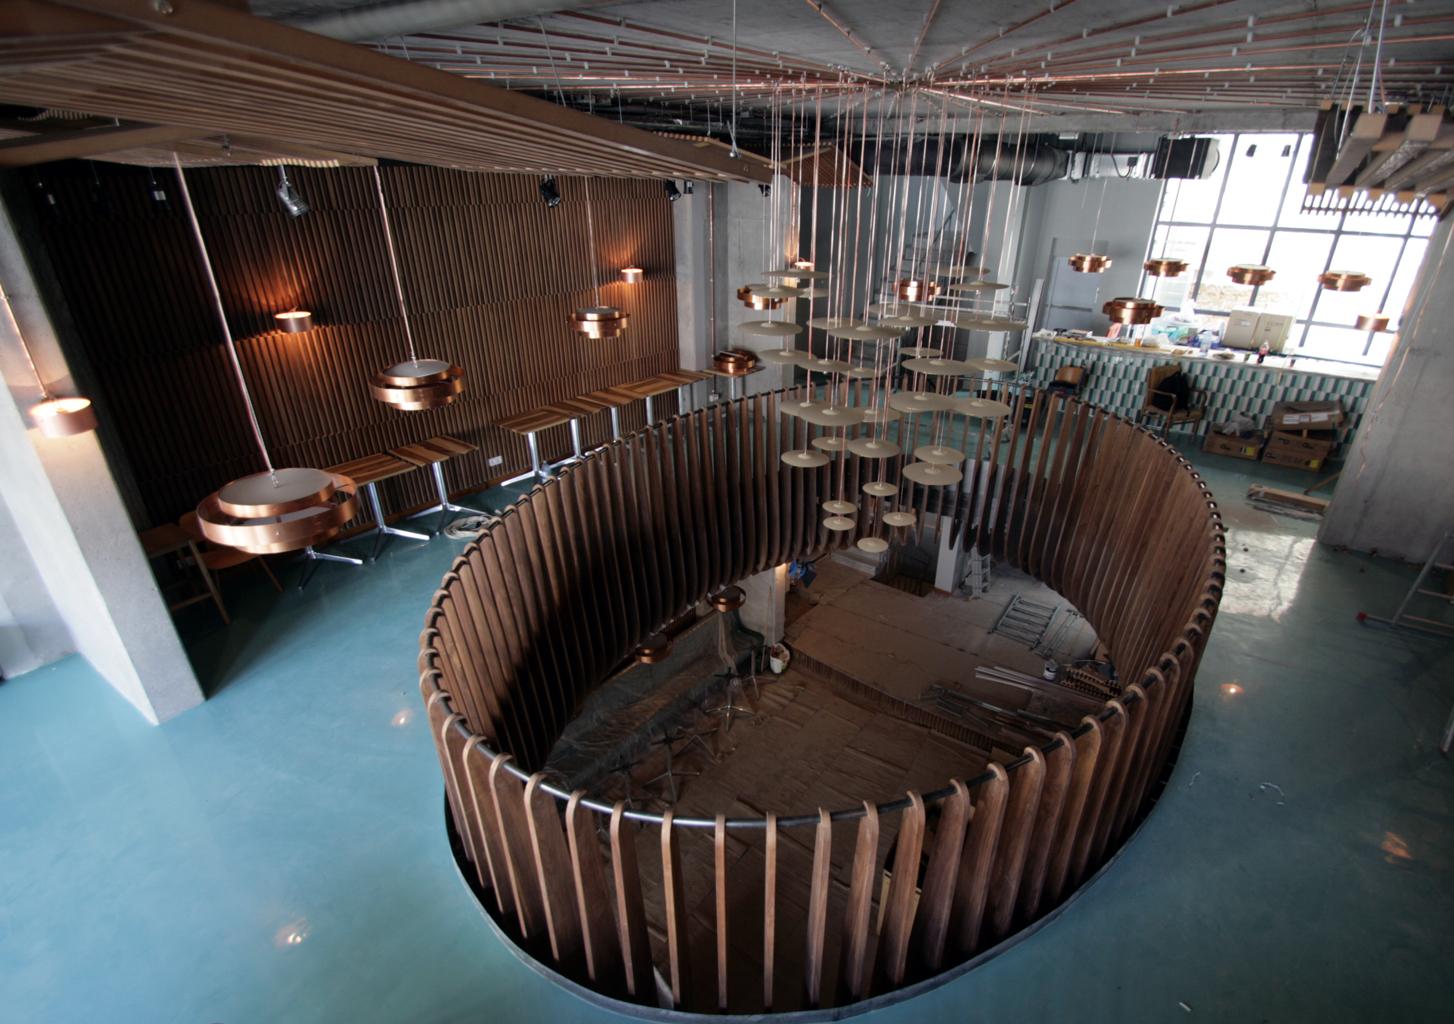 Atipic-balustrada, placari pereti si tavane furnir -cafenea Hermes